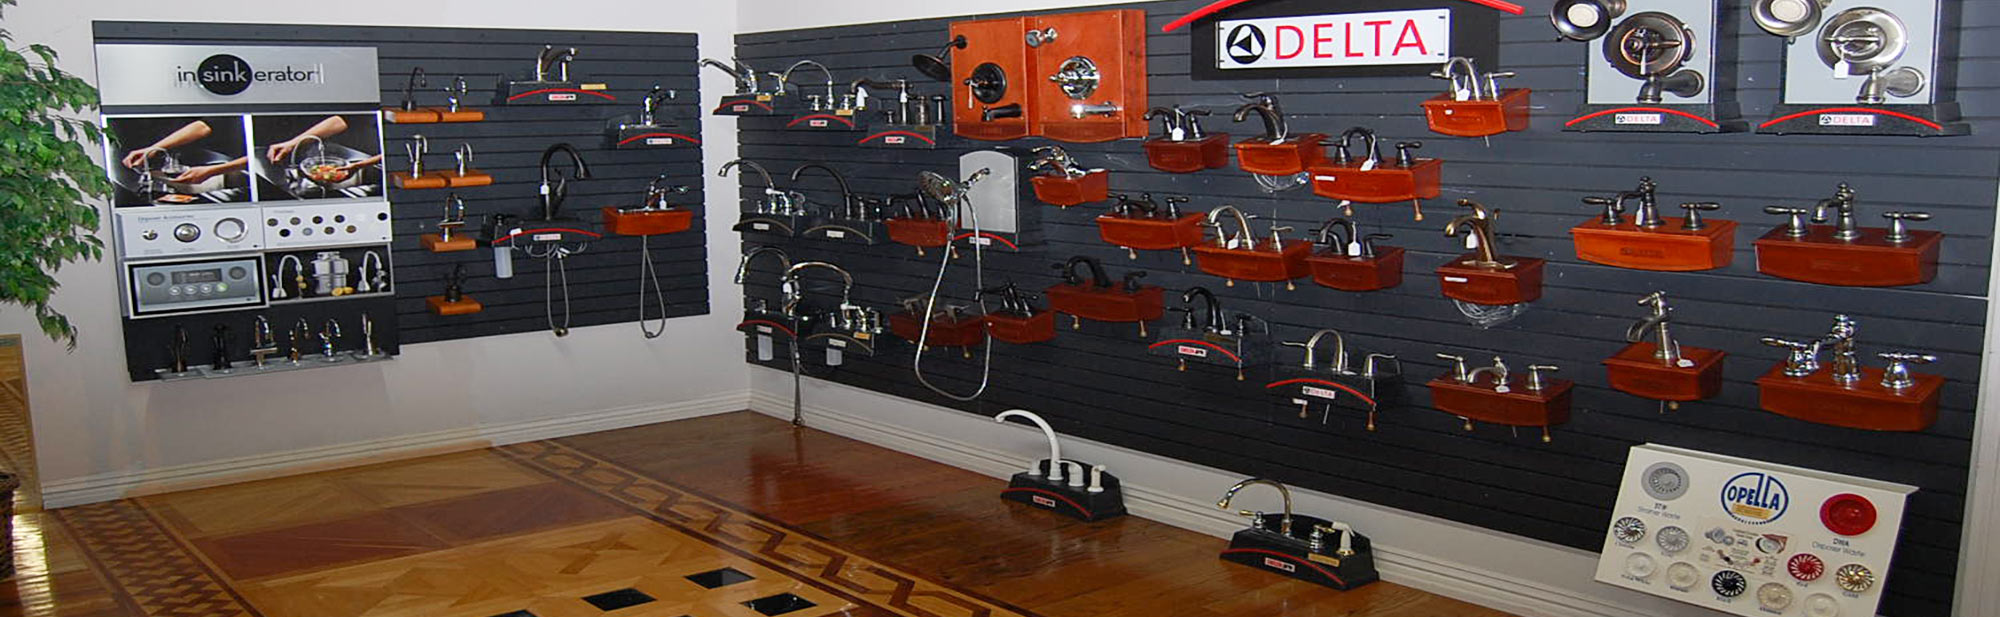 plumbing-center-header